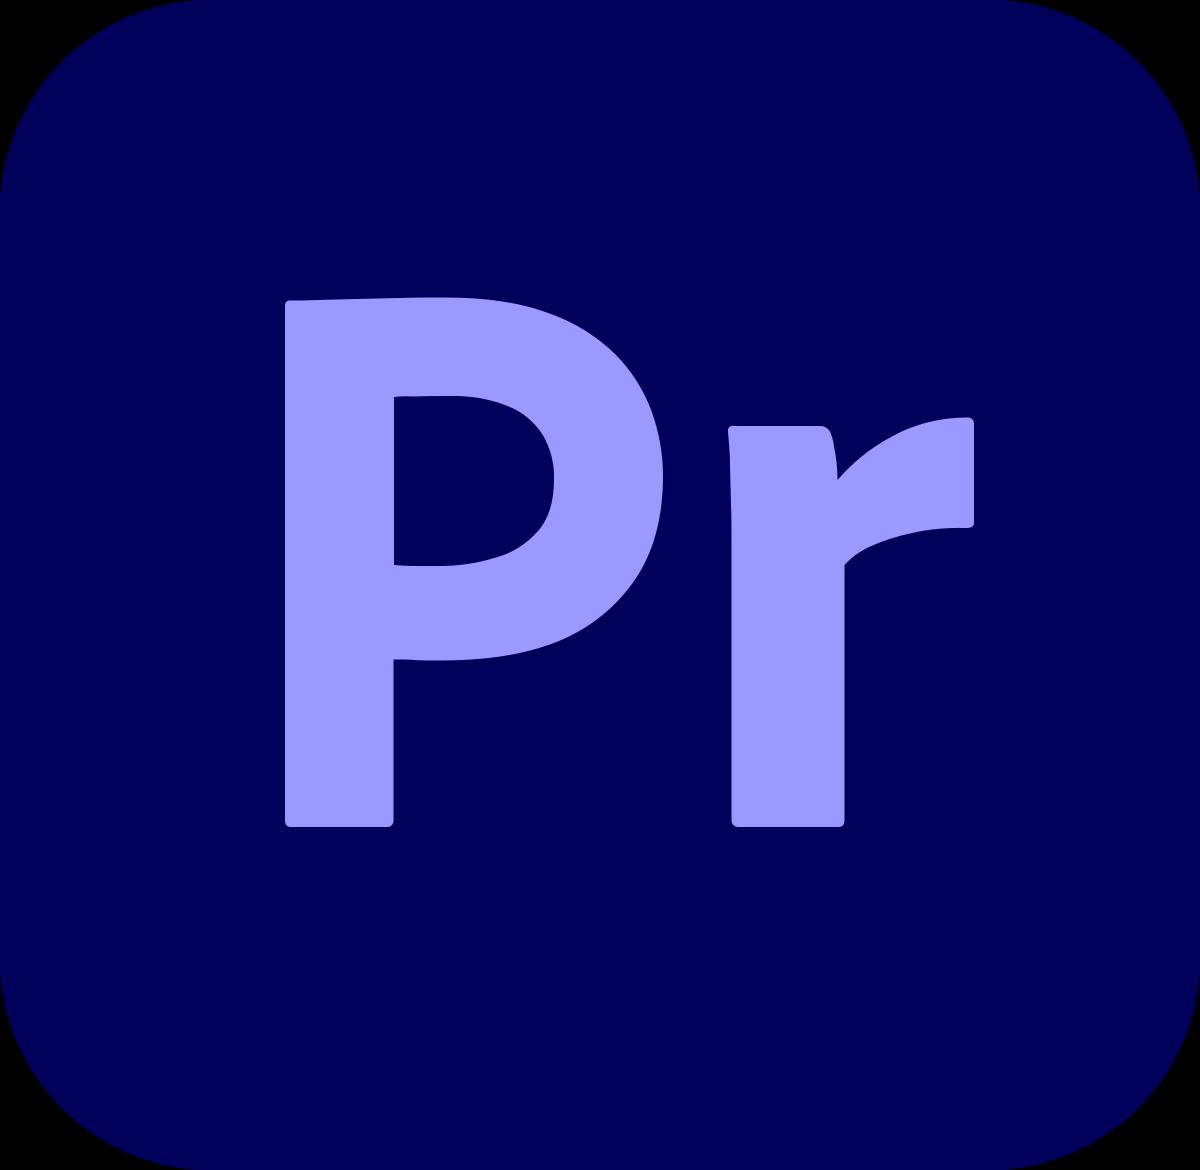 Adobe Adobe-Premiere